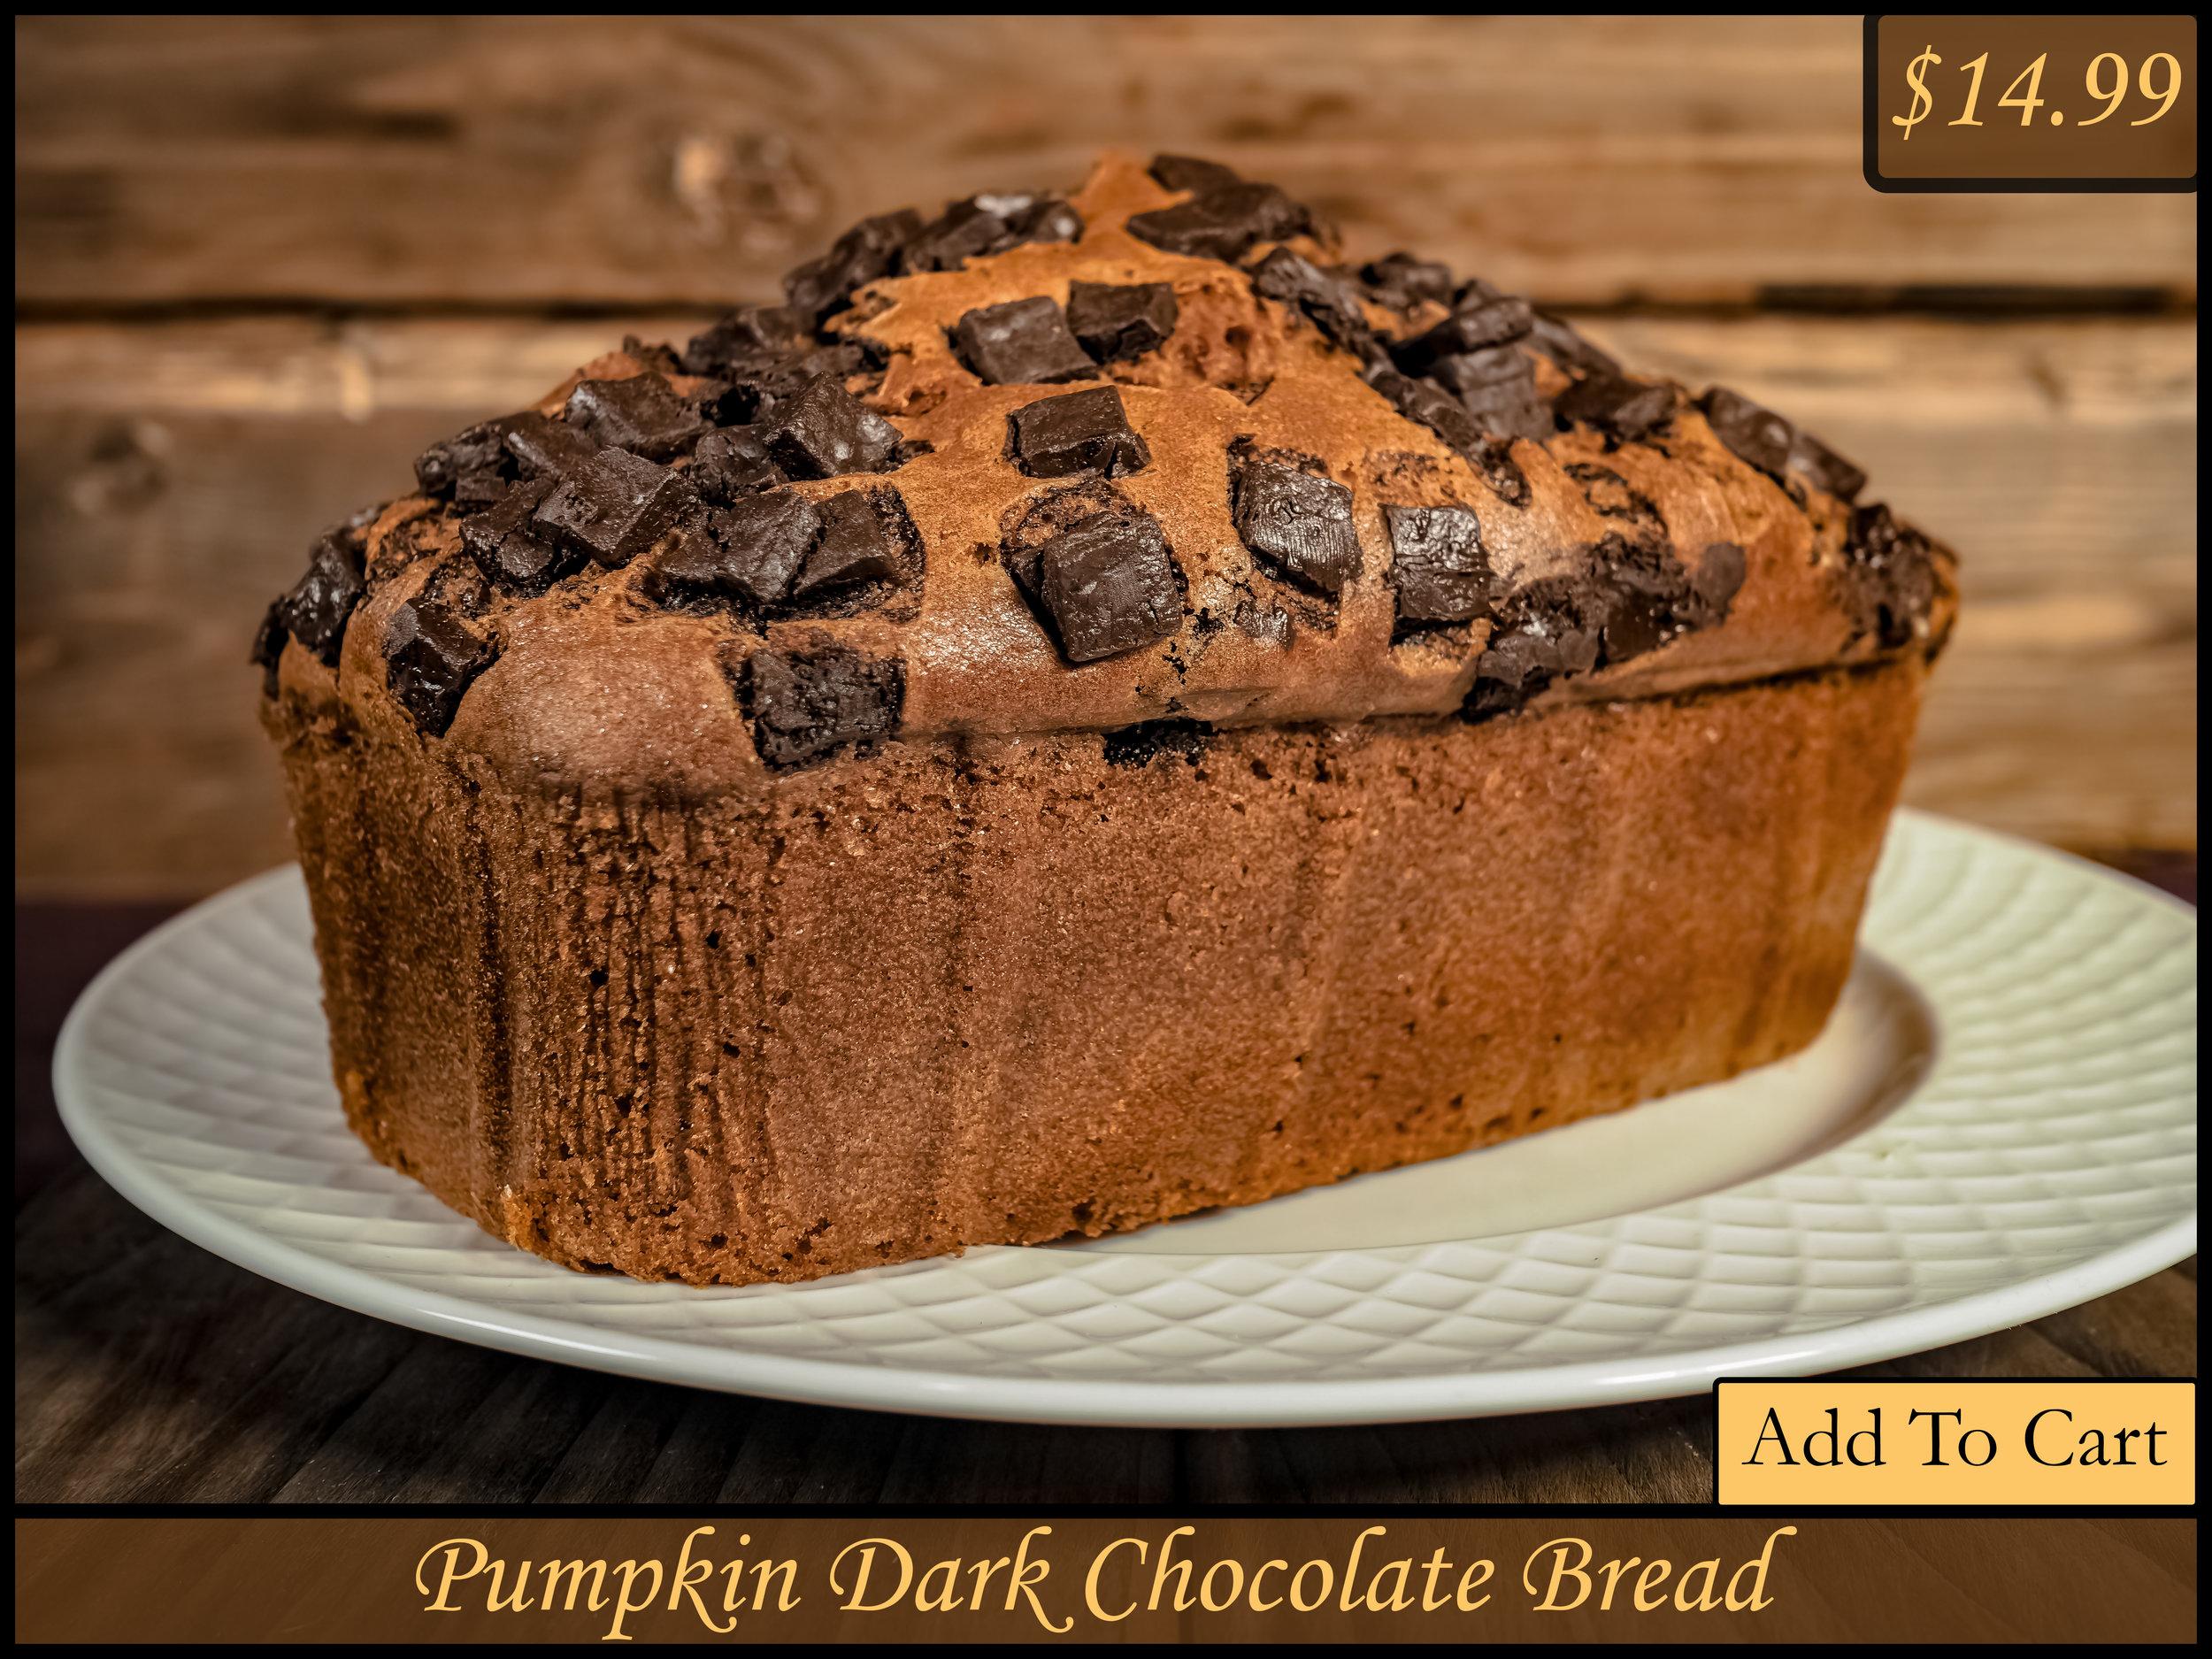 Pumpkin Dark Choco Prod 1.jpg